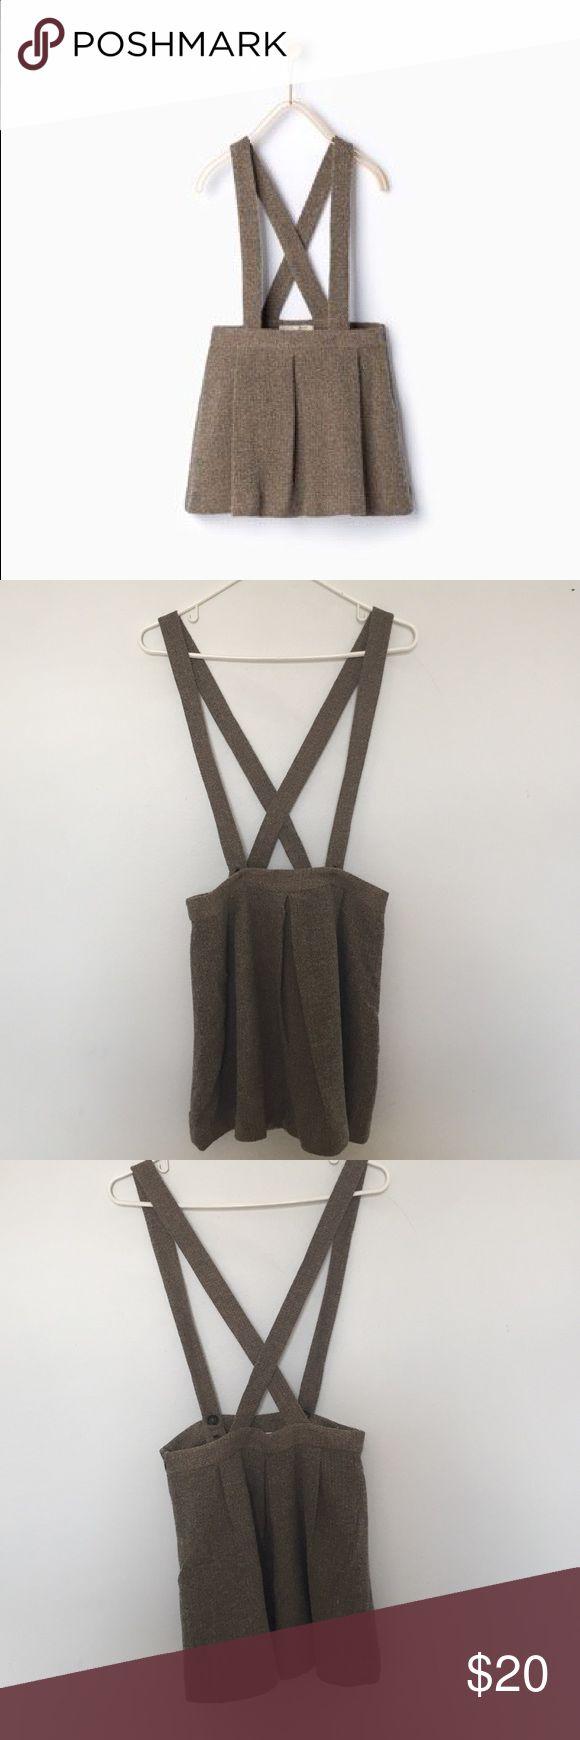 Zara girls skirt with braces Super cute tweed skirt with braces for an older girl. Worn once! Zara Bottoms Skirts